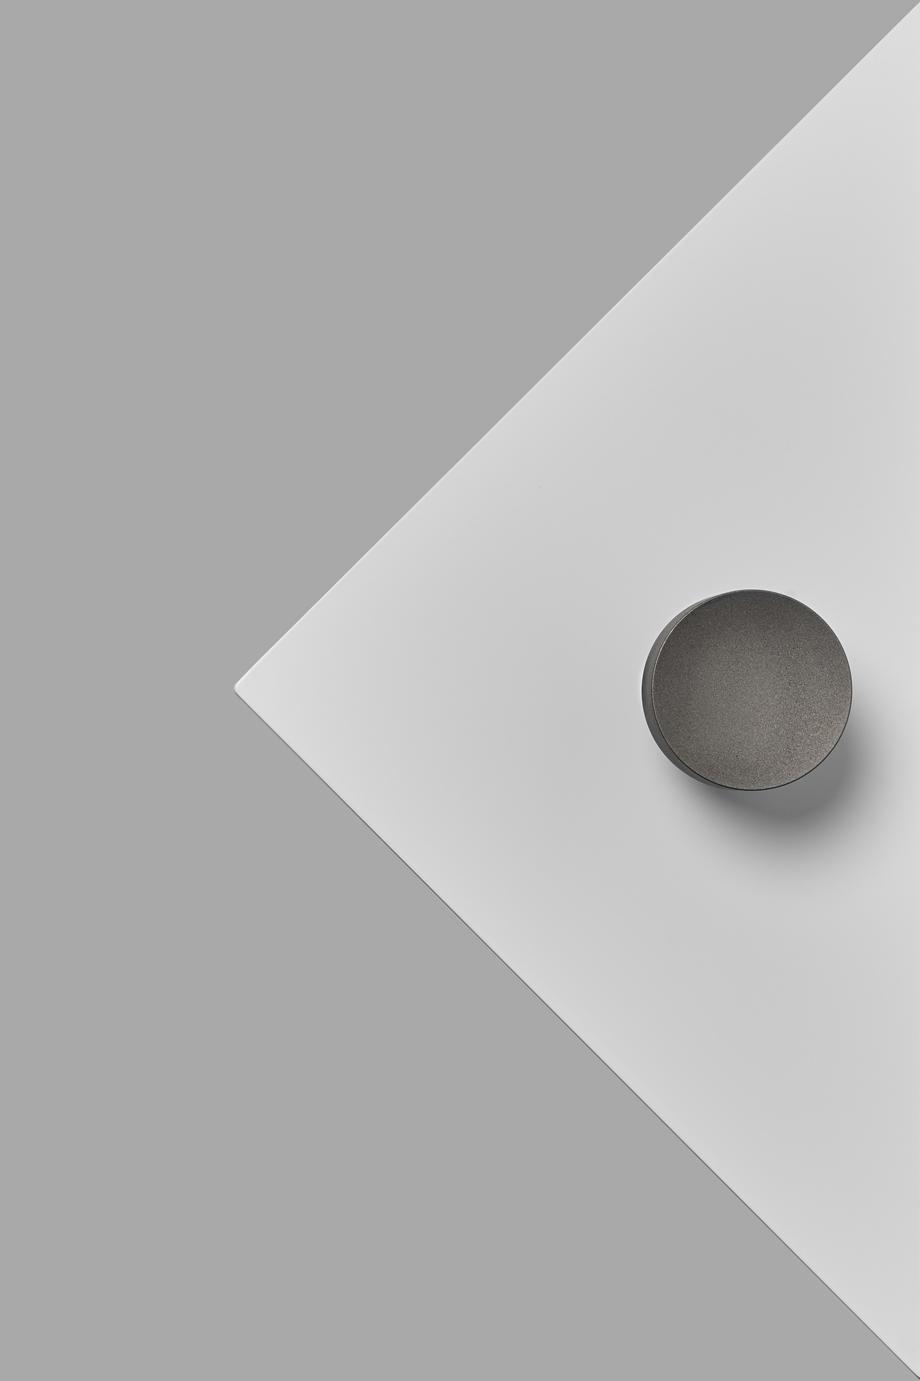 Bit Part-Brooke Holm-Megan Morton-Blasted Stainless Steel-Door Knob-White-Backplate.jpg